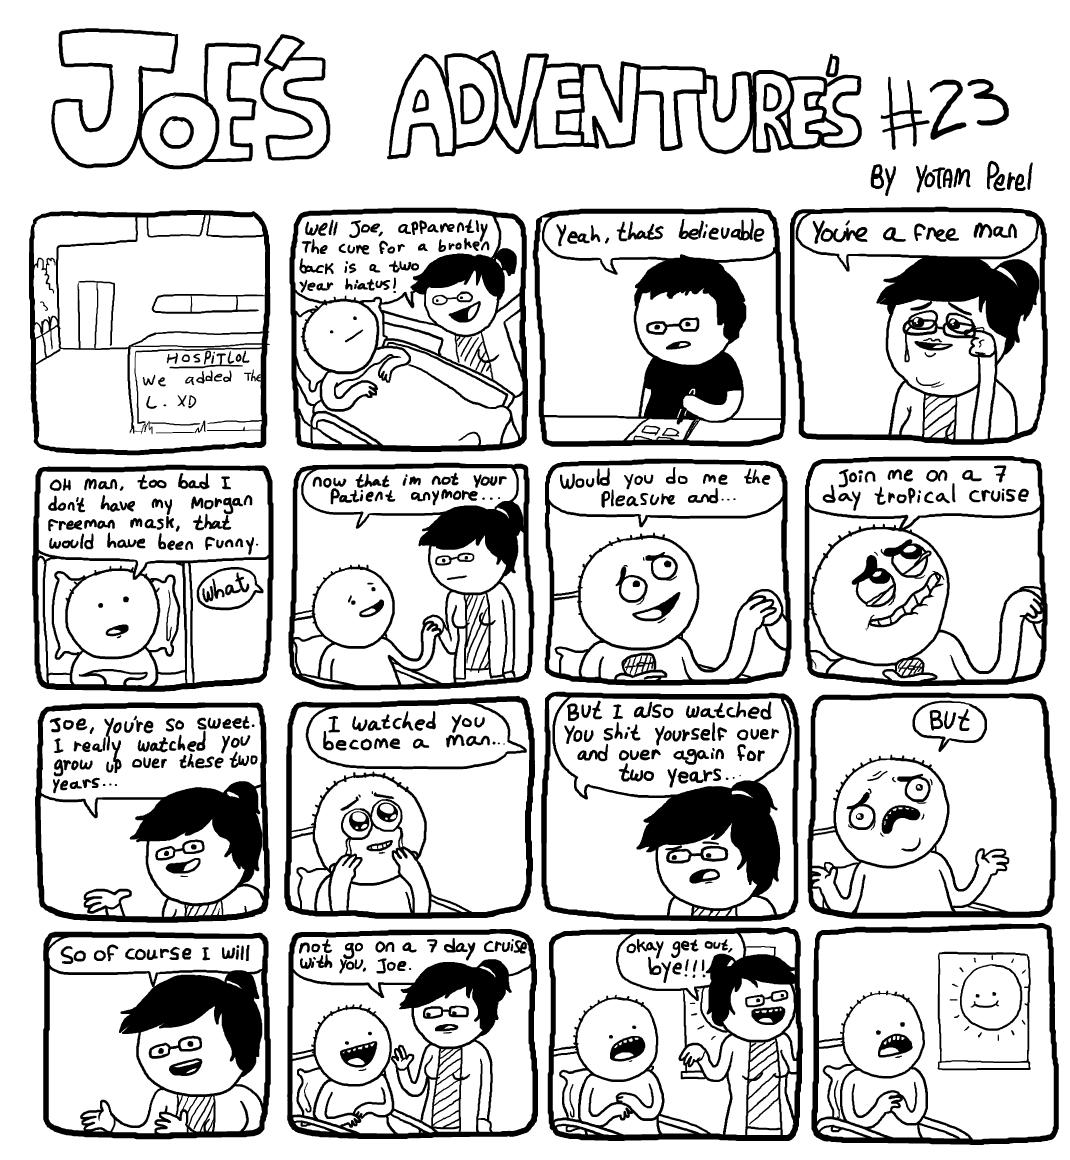 Joe's Adventure's 23